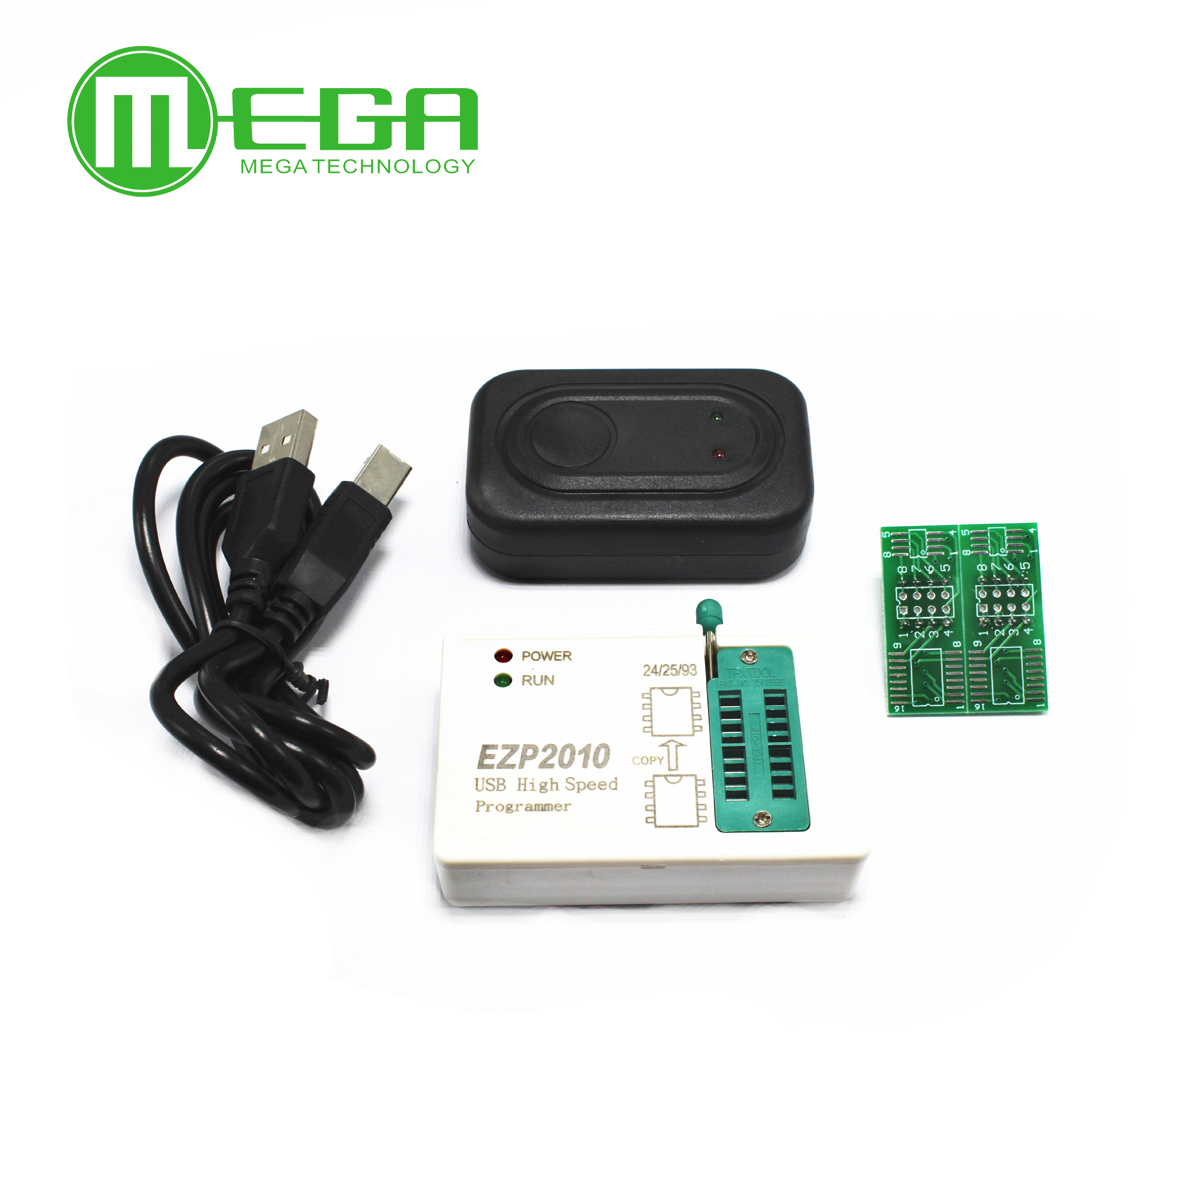 EZP2010 programmeur SPI USB haute vitesse support24 25 93 EEPROM 25 puce bios flash